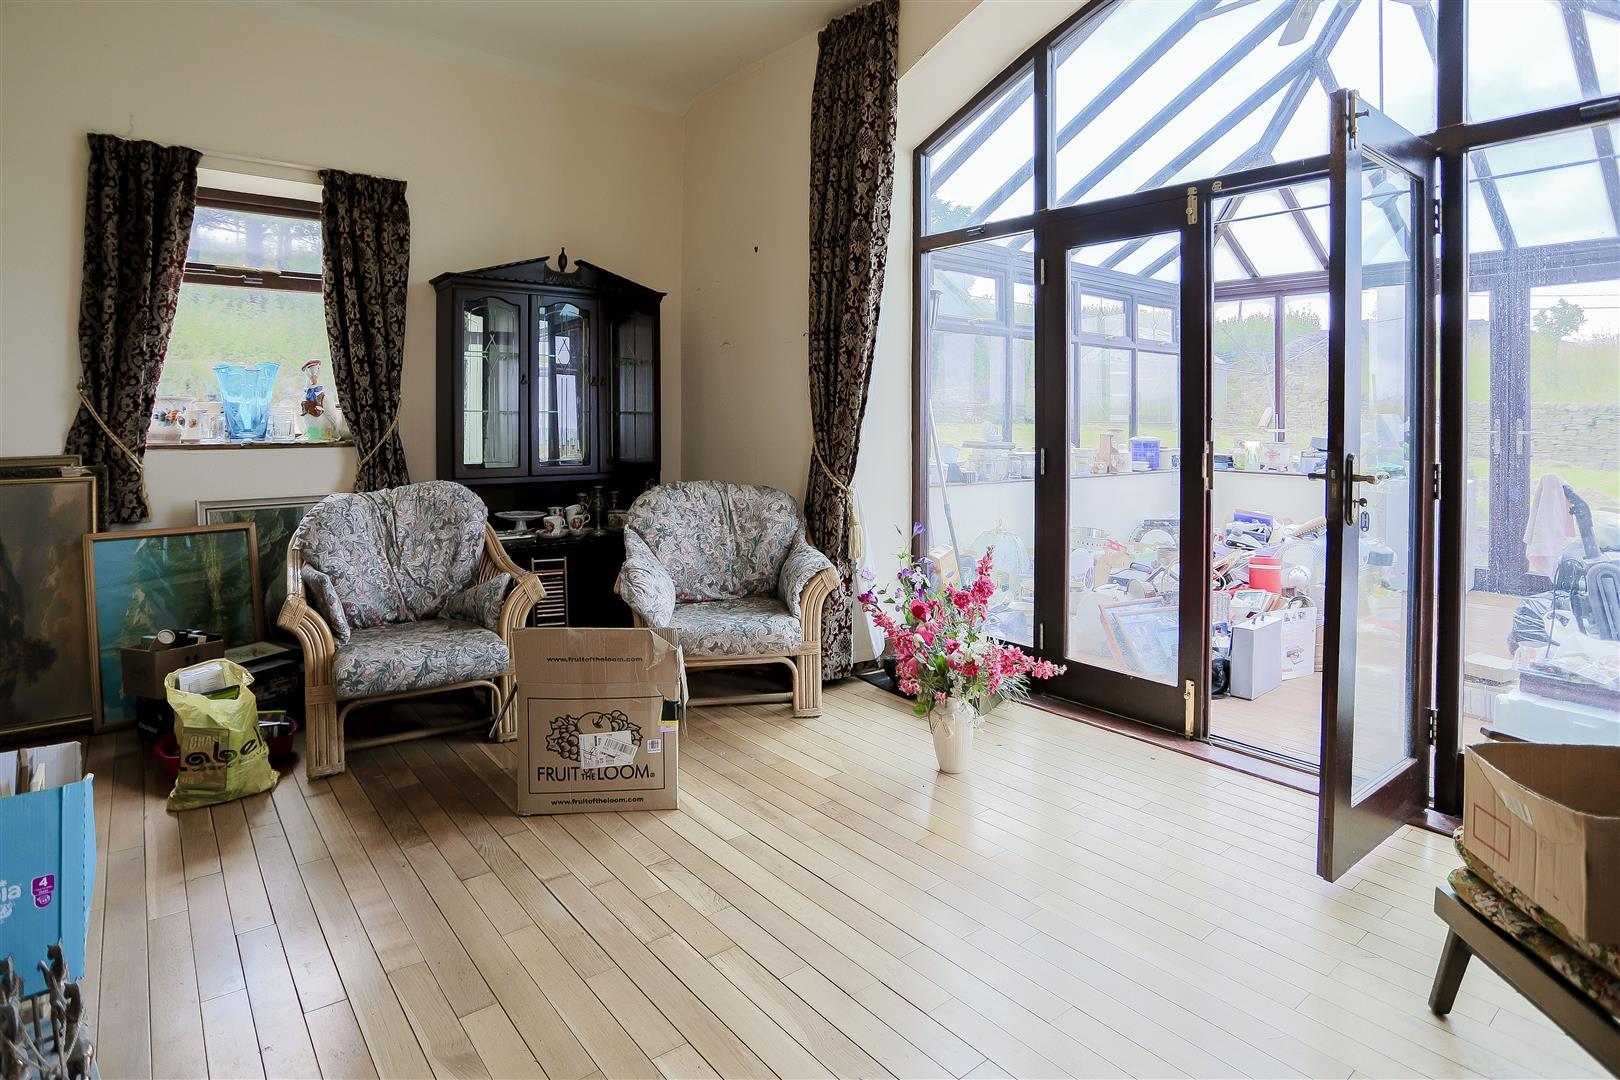 2 Bedroom Barn Conversion For Sale - IMG_2405.jpg